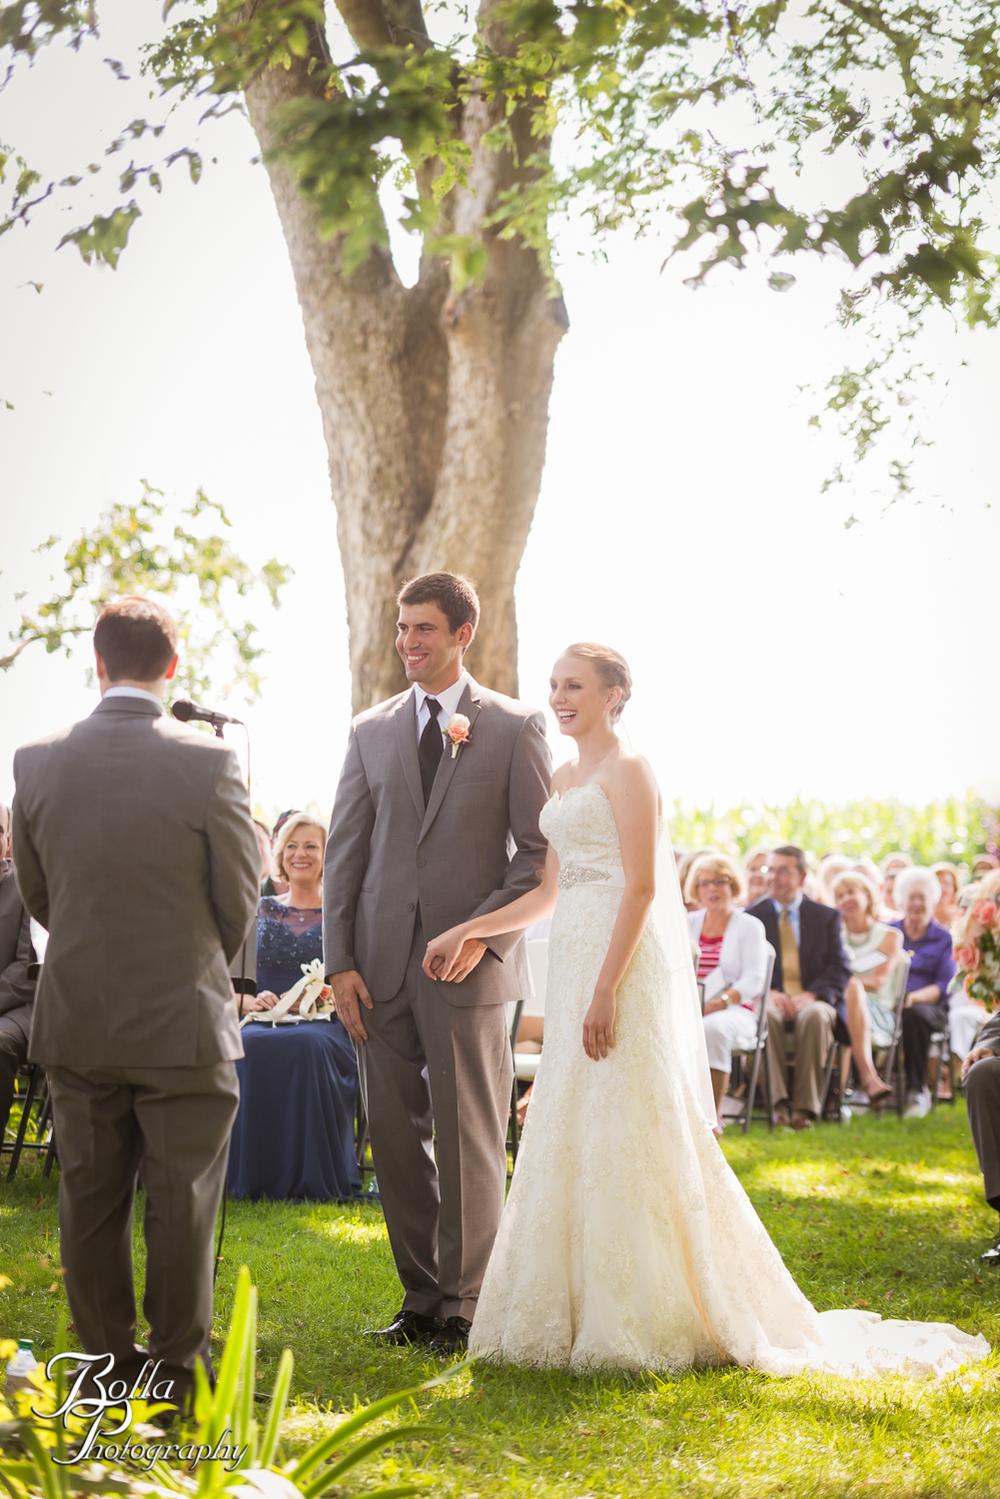 Bolla_Photography_St_Louis_wedding_photographer-0081.jpg